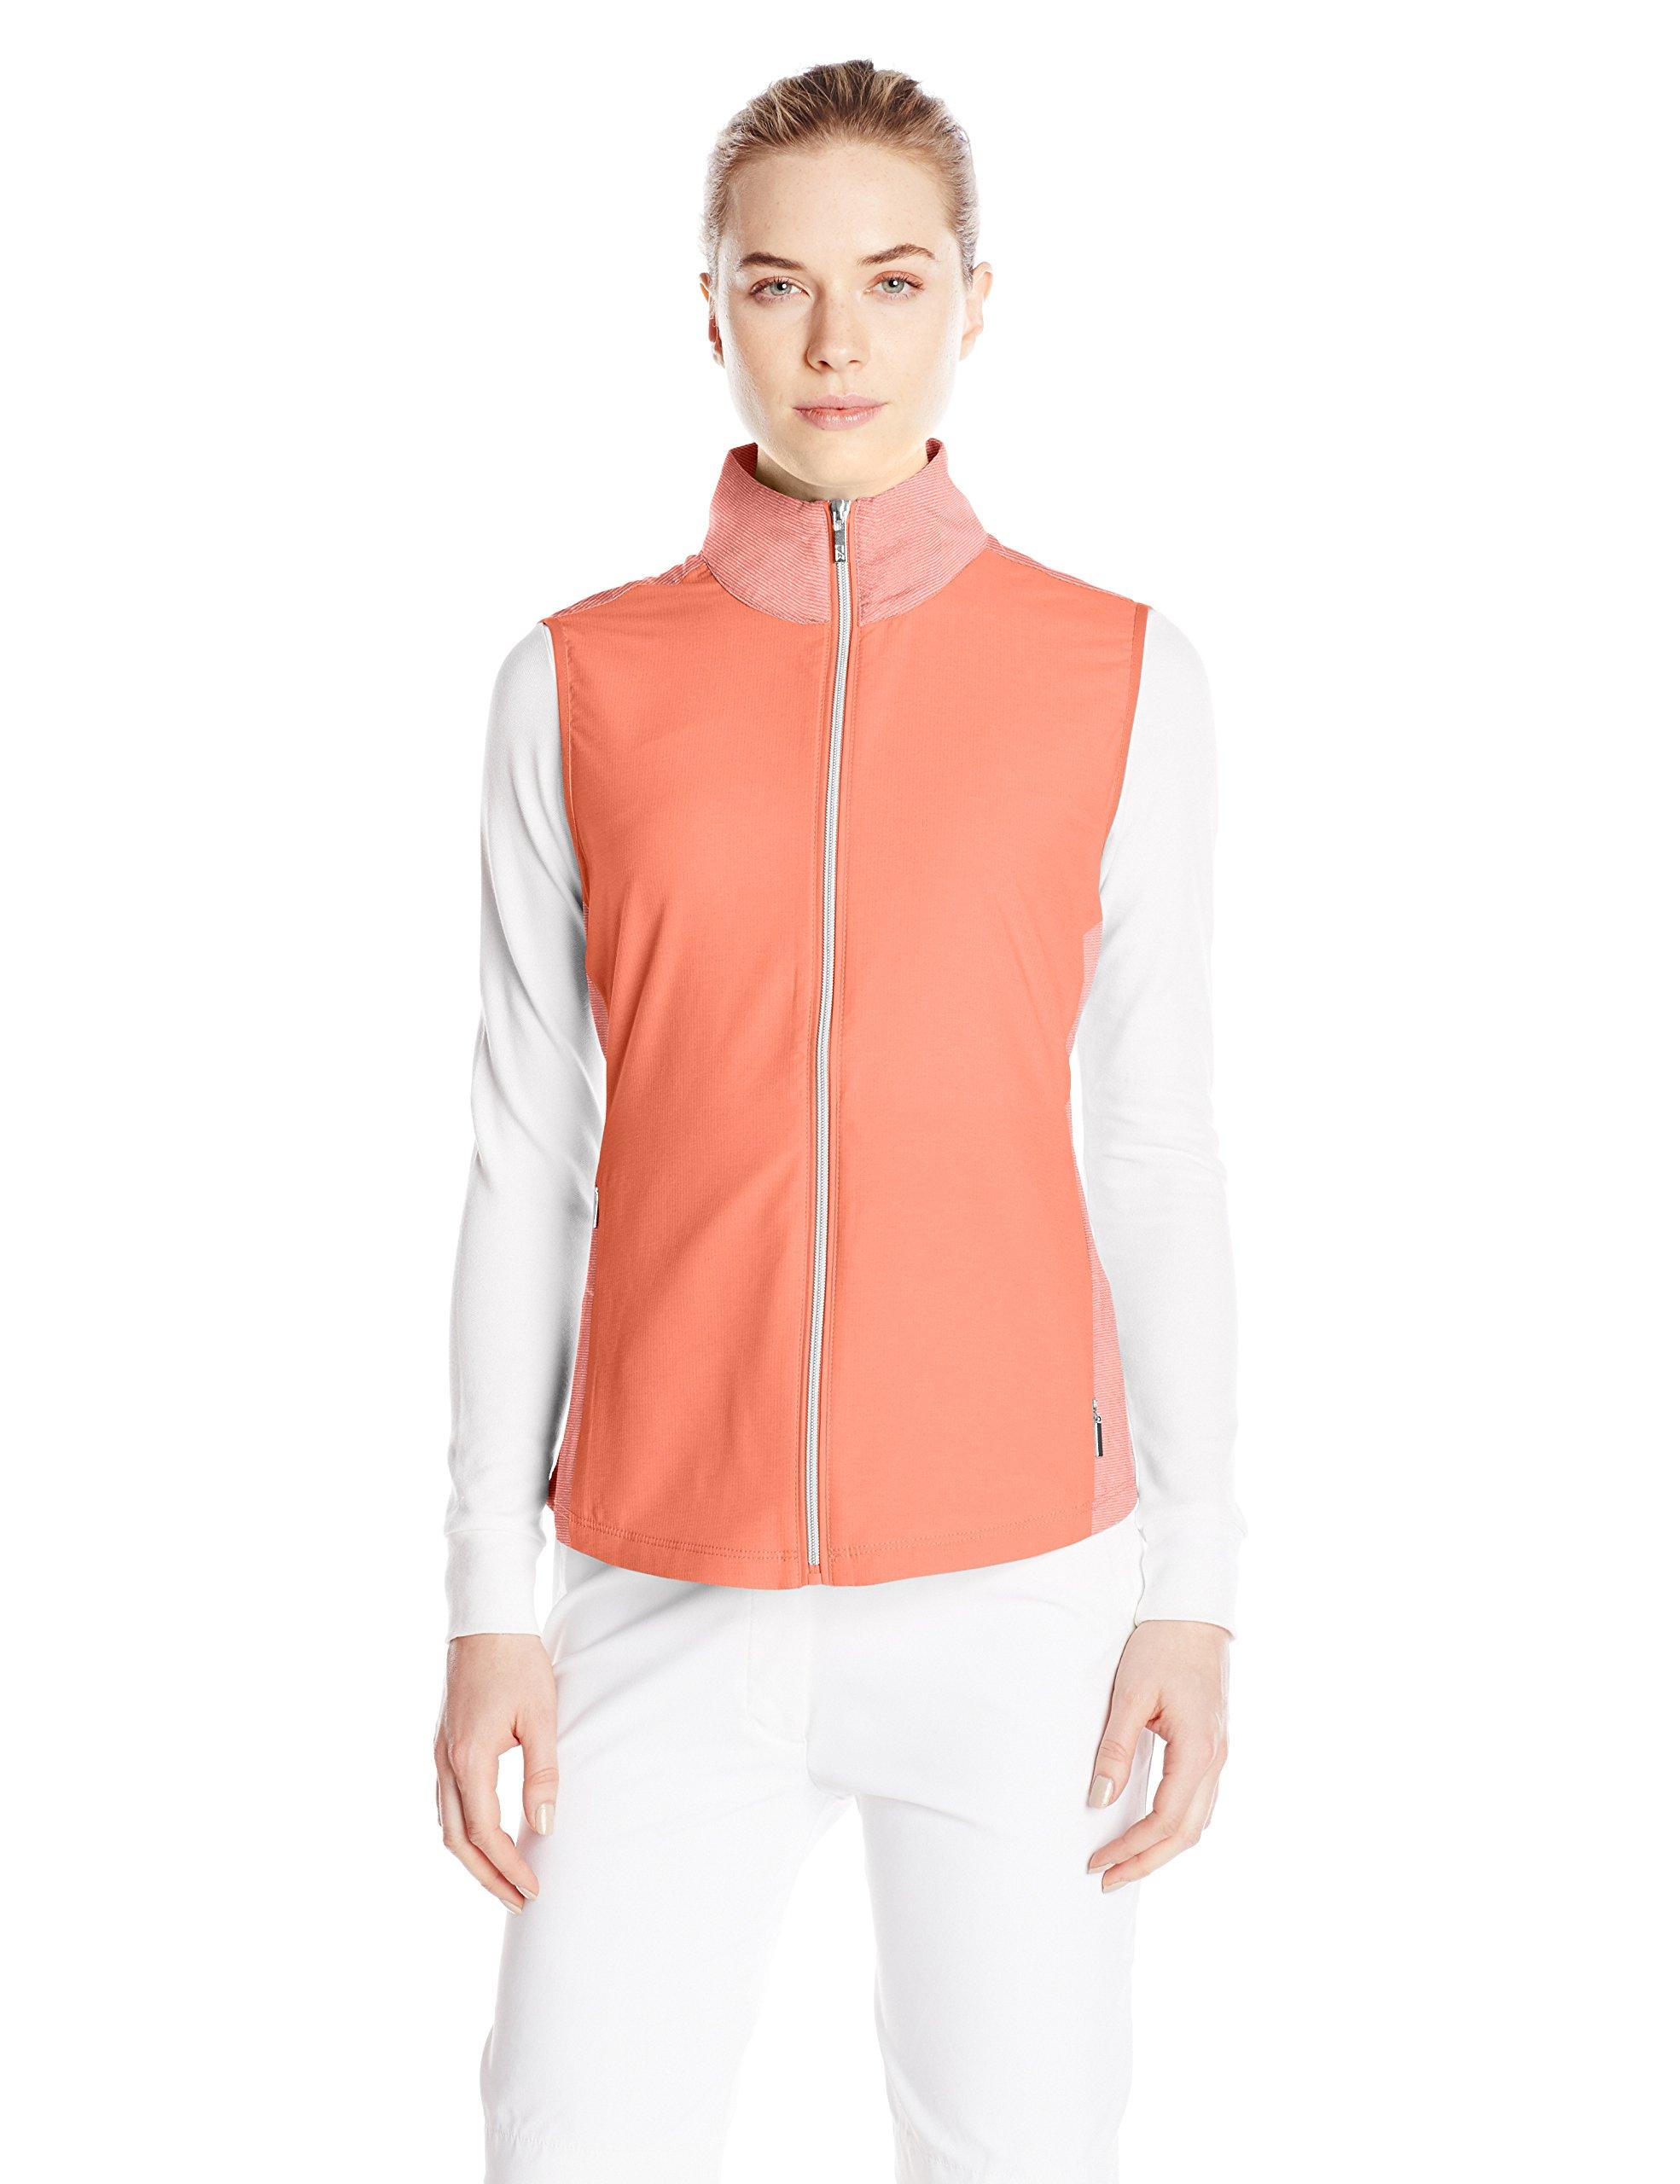 Cutter & Buck Women's CB Weathertec Laura Hybrid Vest, Spark, X-Small by Cutter & Buck (Image #1)